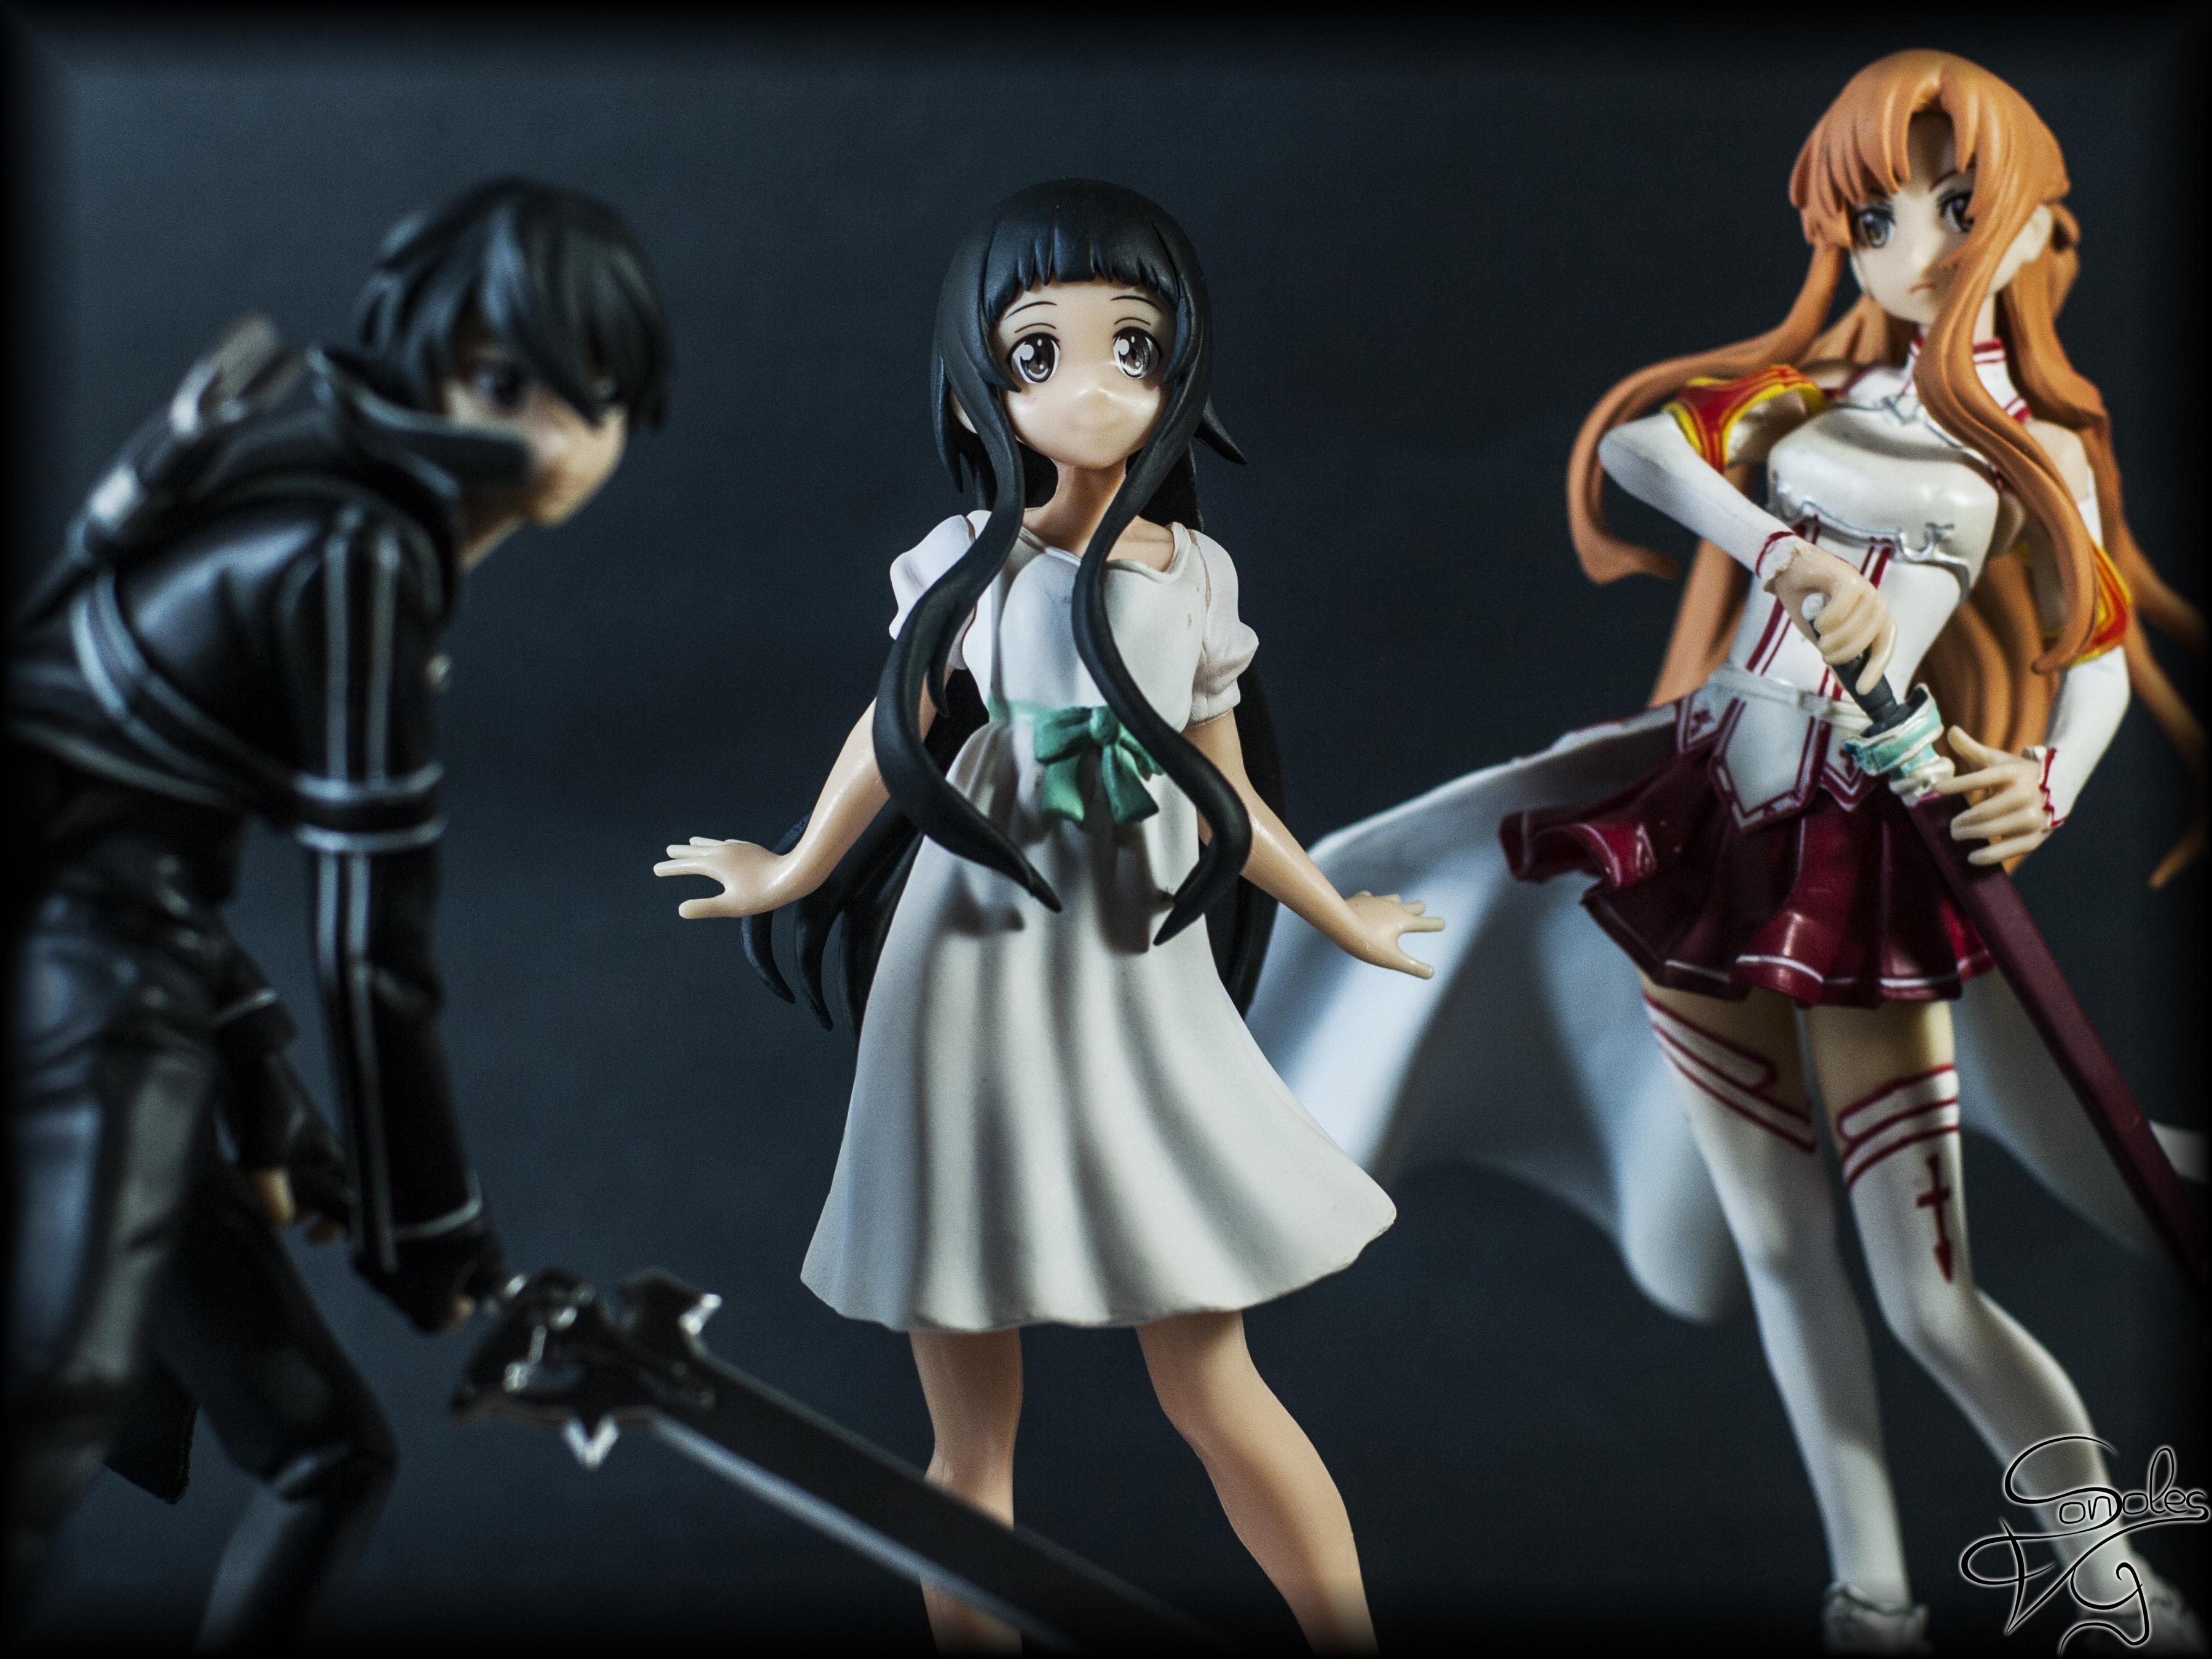 Kirito, Yui and Asuna (Sword Art Online) by sonsolesfeviga ... Sword Art Online Wallpaper 1920x1080 Yui